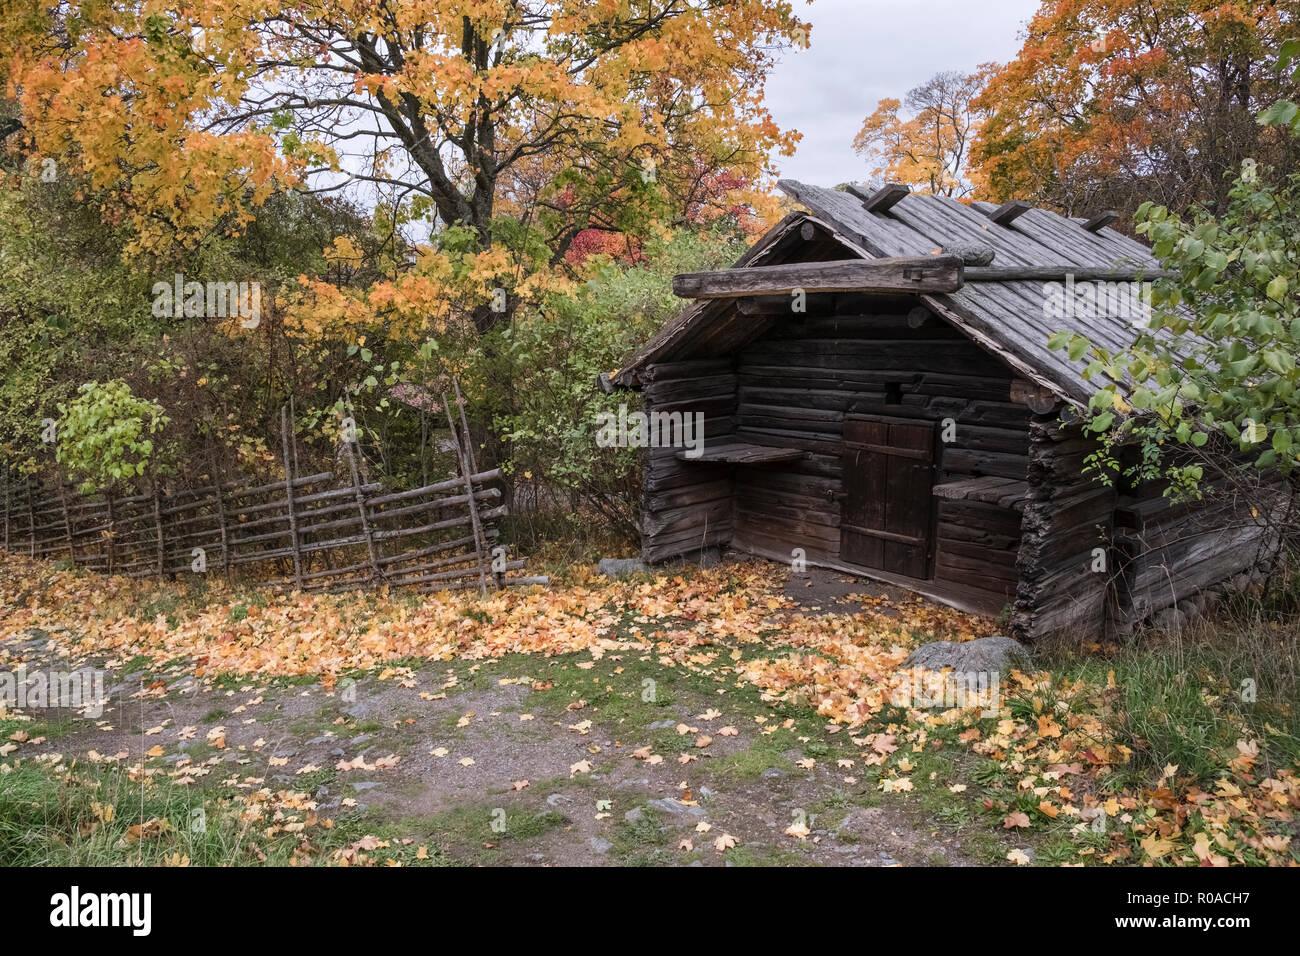 Example of traditional pre industrial wooden cabin building at Skansen open air museum, October, Djurgarden, Stockholm, Sweden. - Stock Image